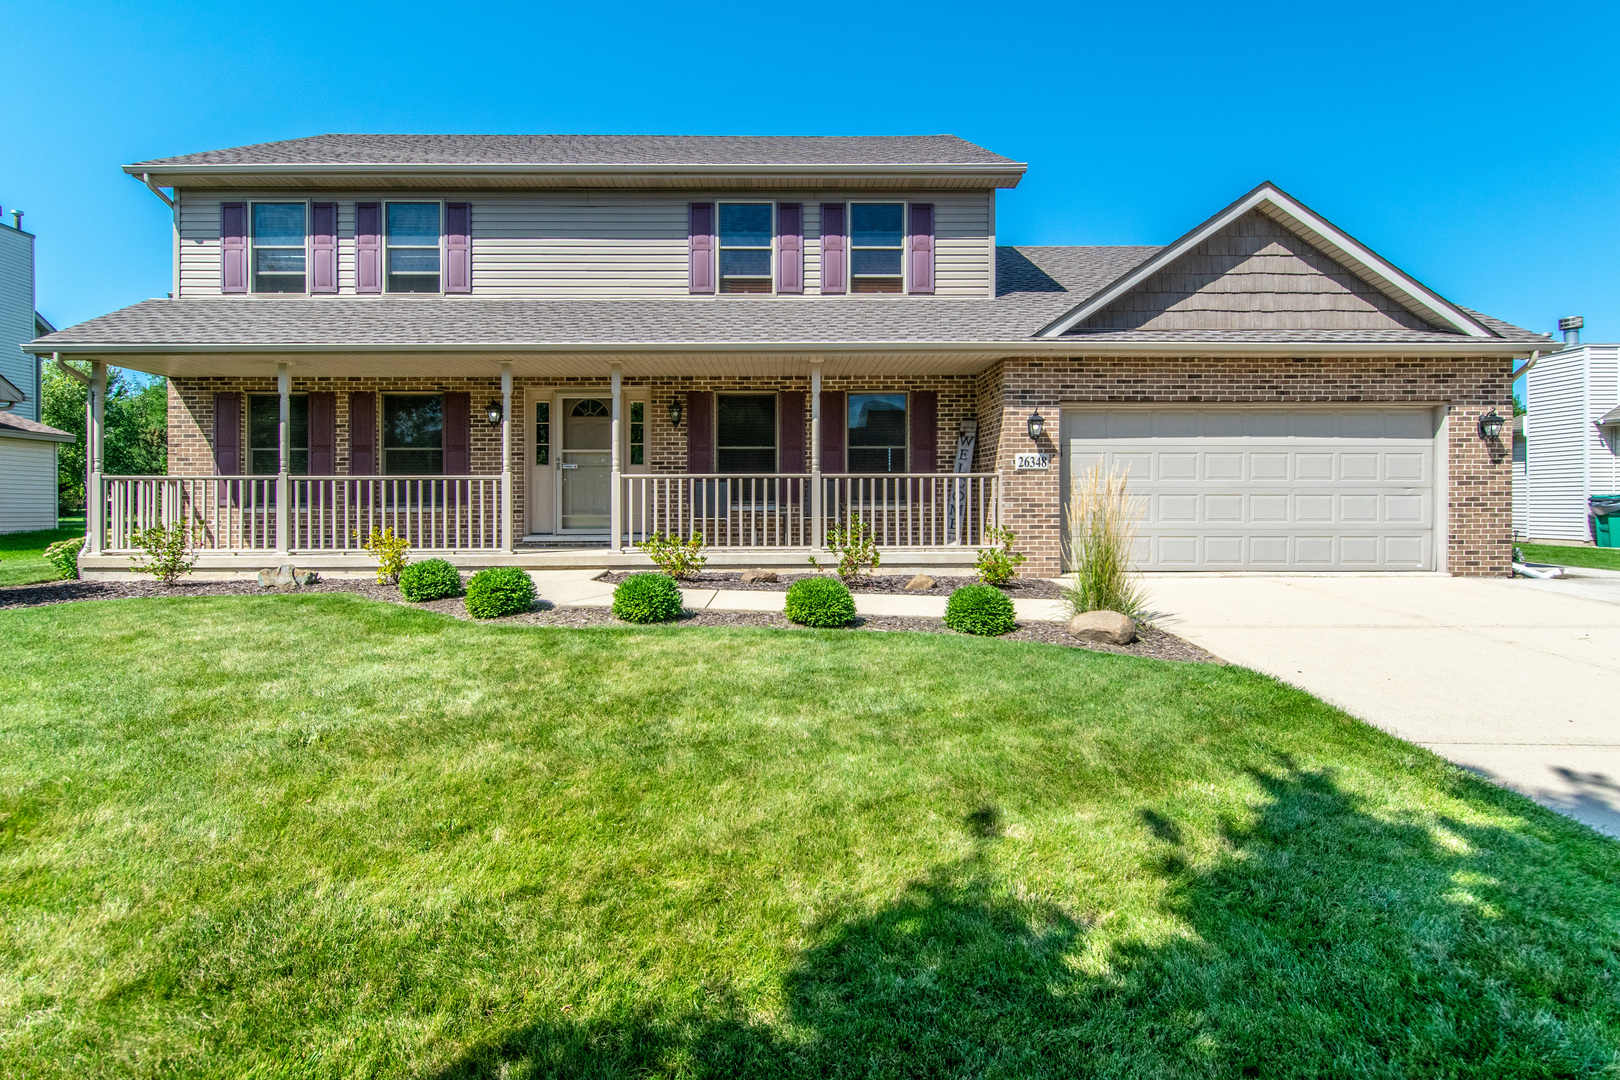 26348 South Jacob, Channahon, Illinois, 60410